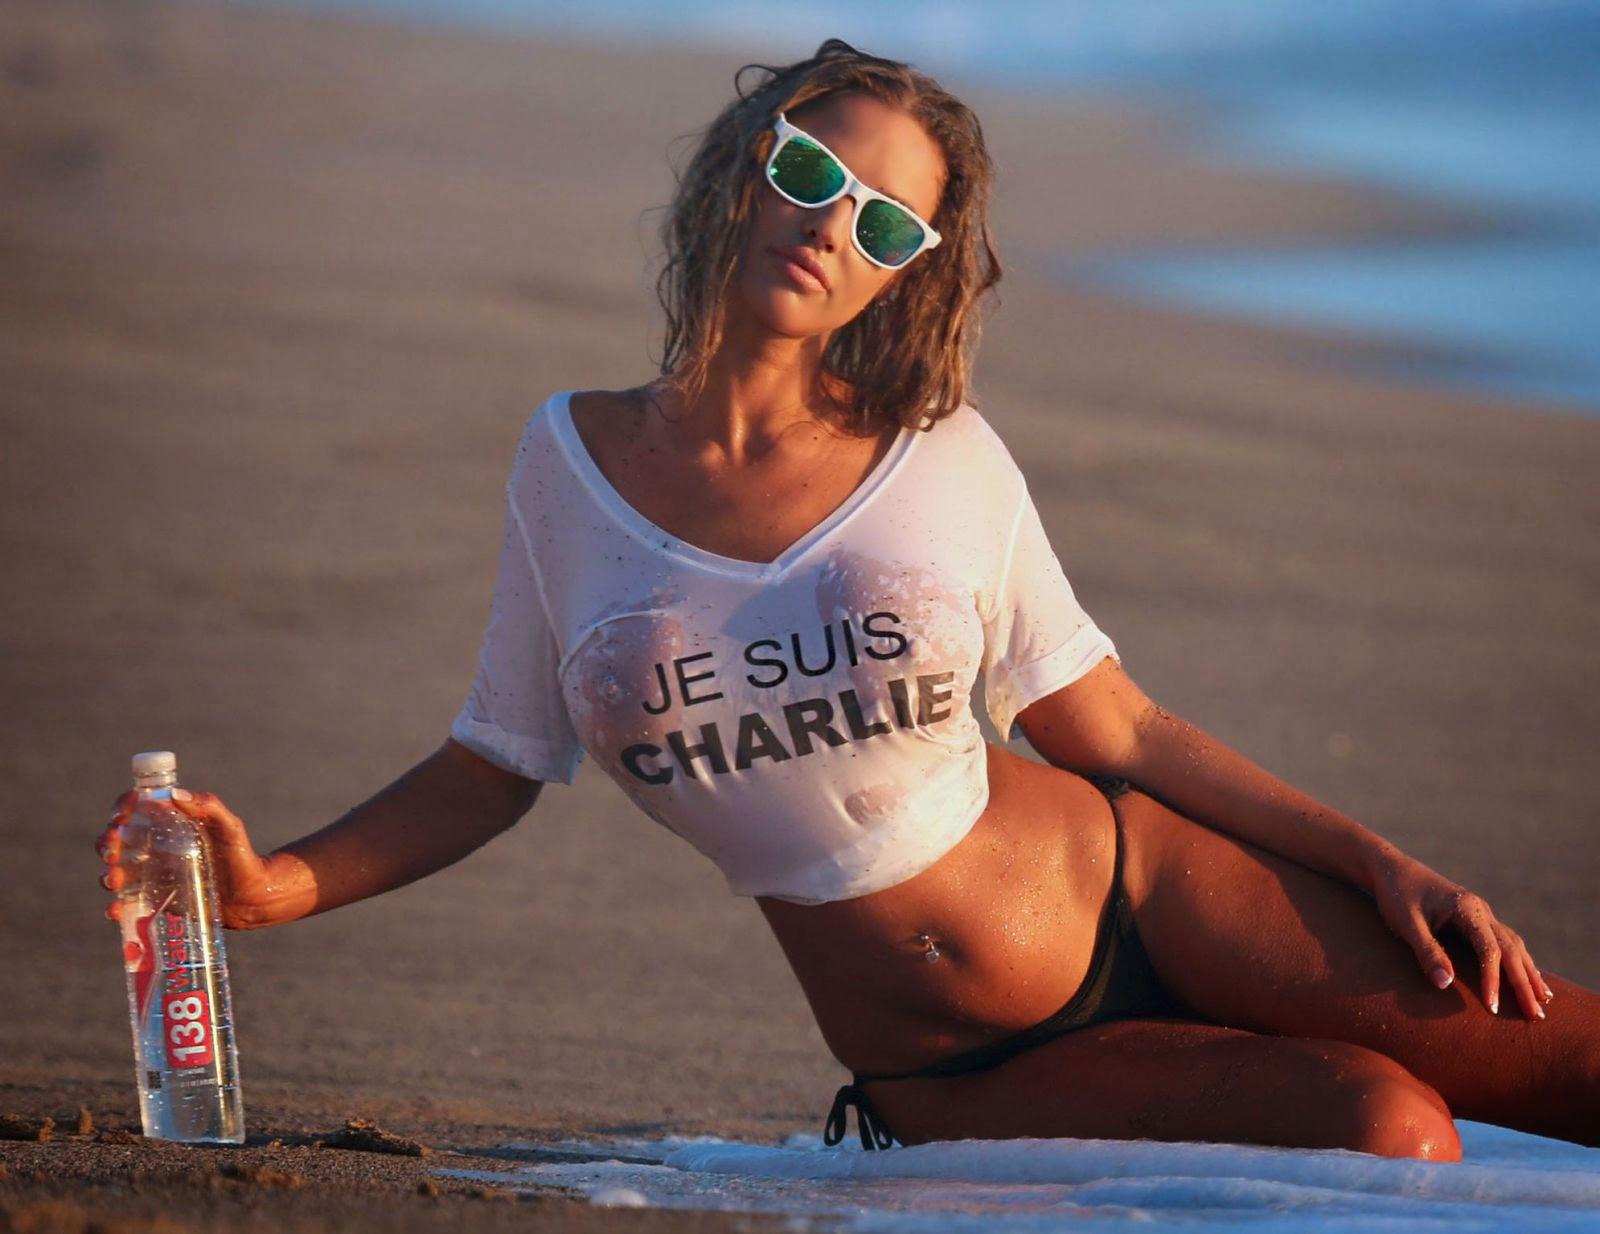 Bikini wet t shirt